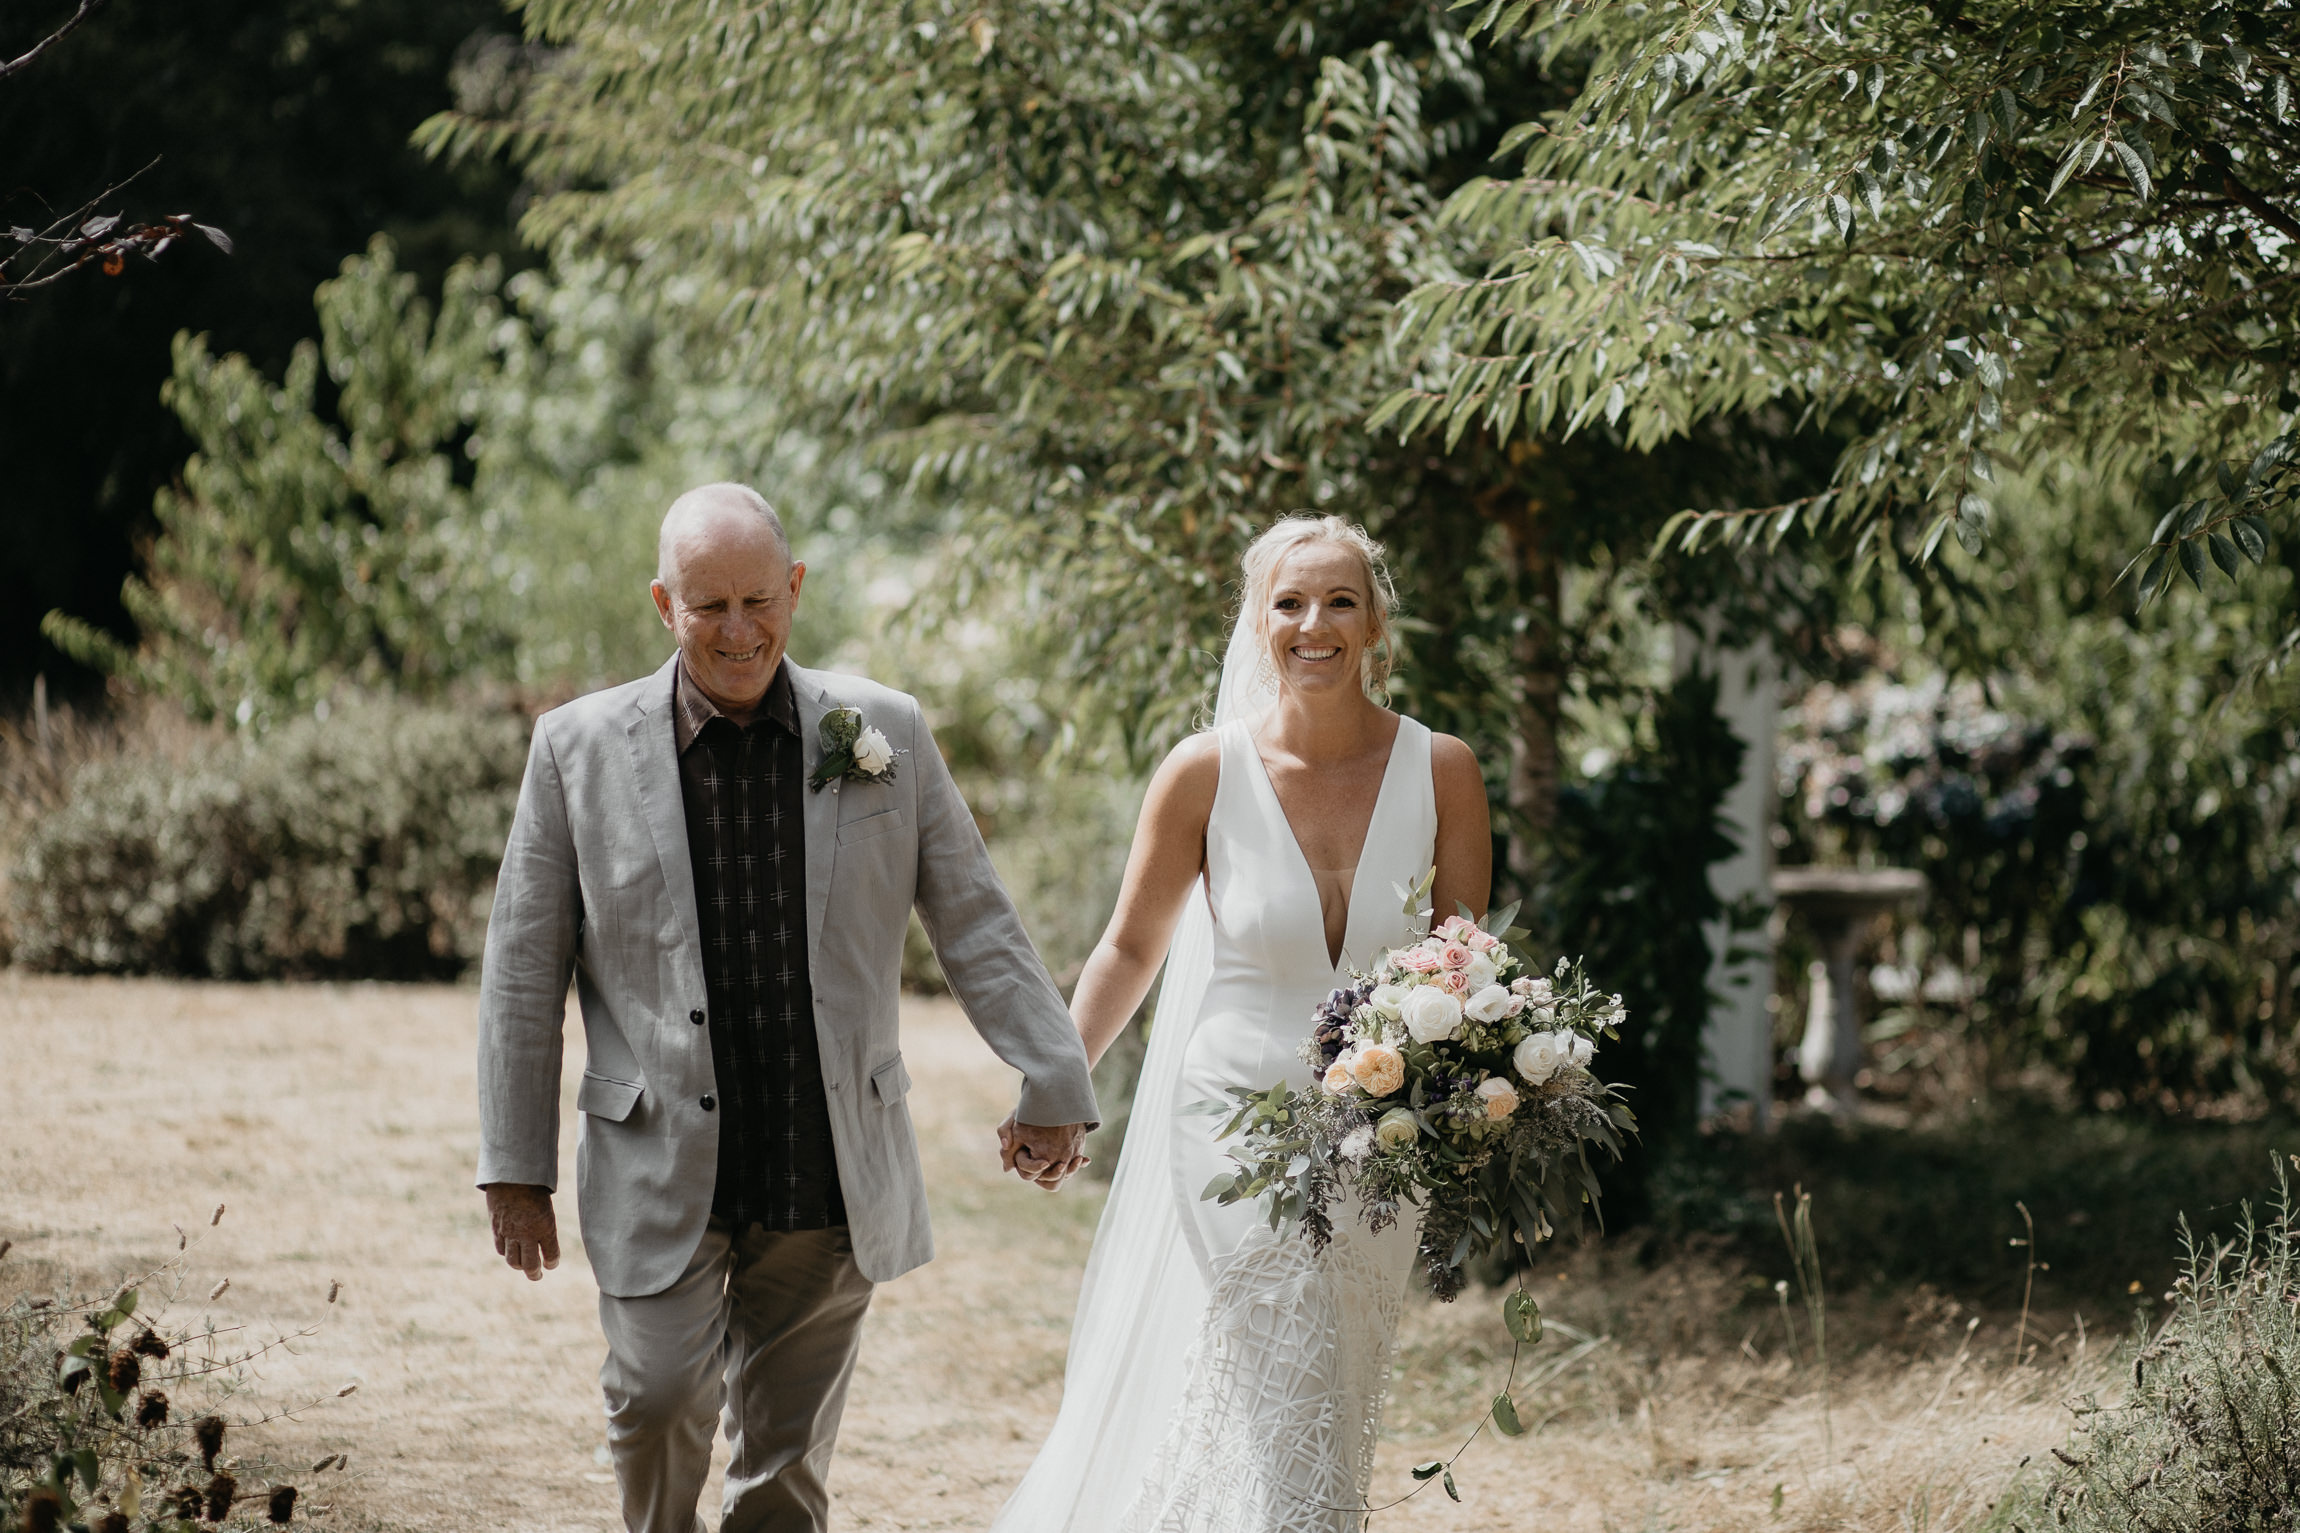 oldforestschool-wedding-blog-99.jpg